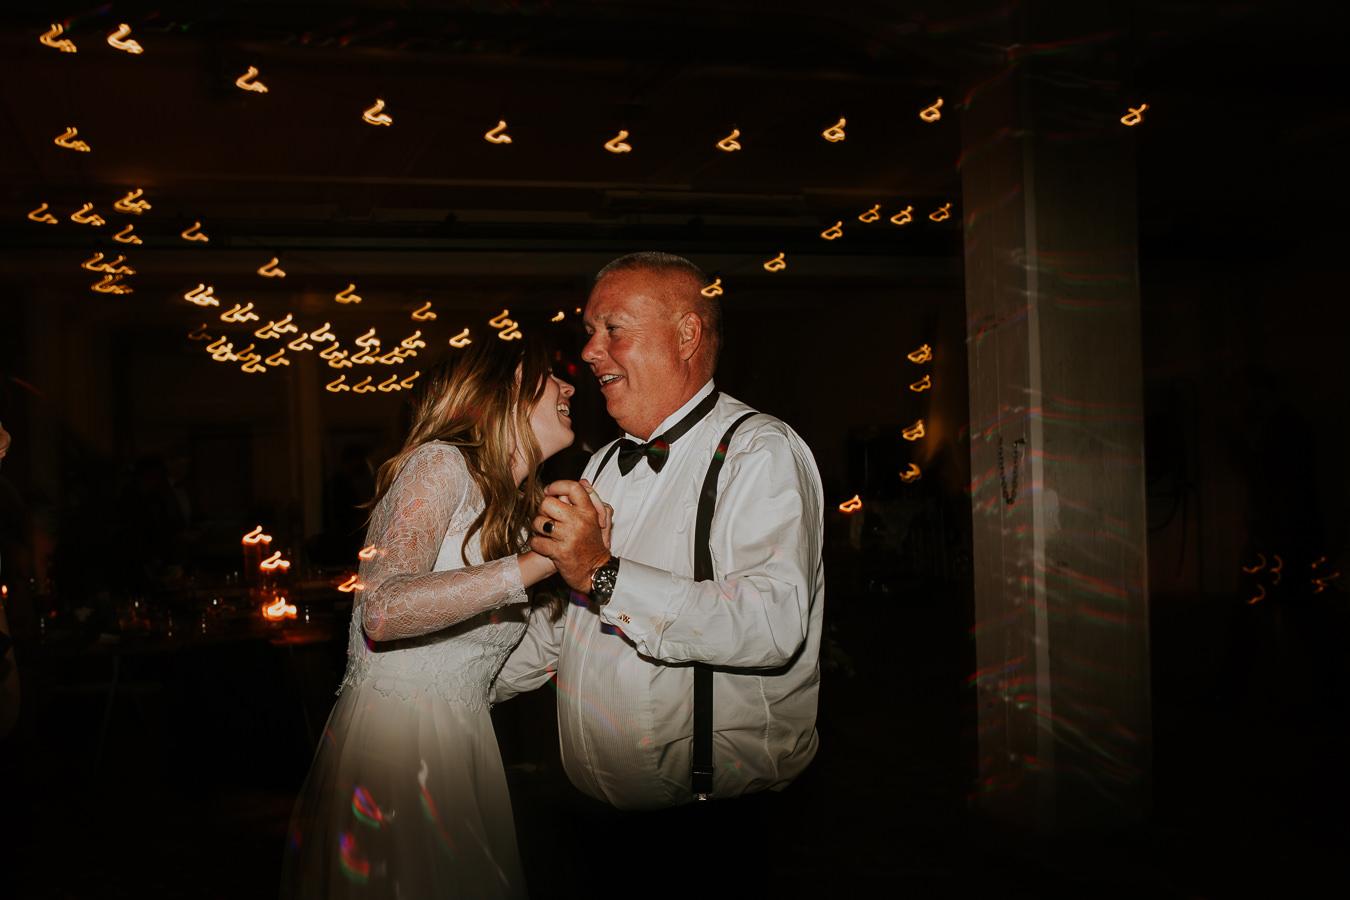 Bryllup-Lageret-Tofte-bryllupsfotograf-197.jpg